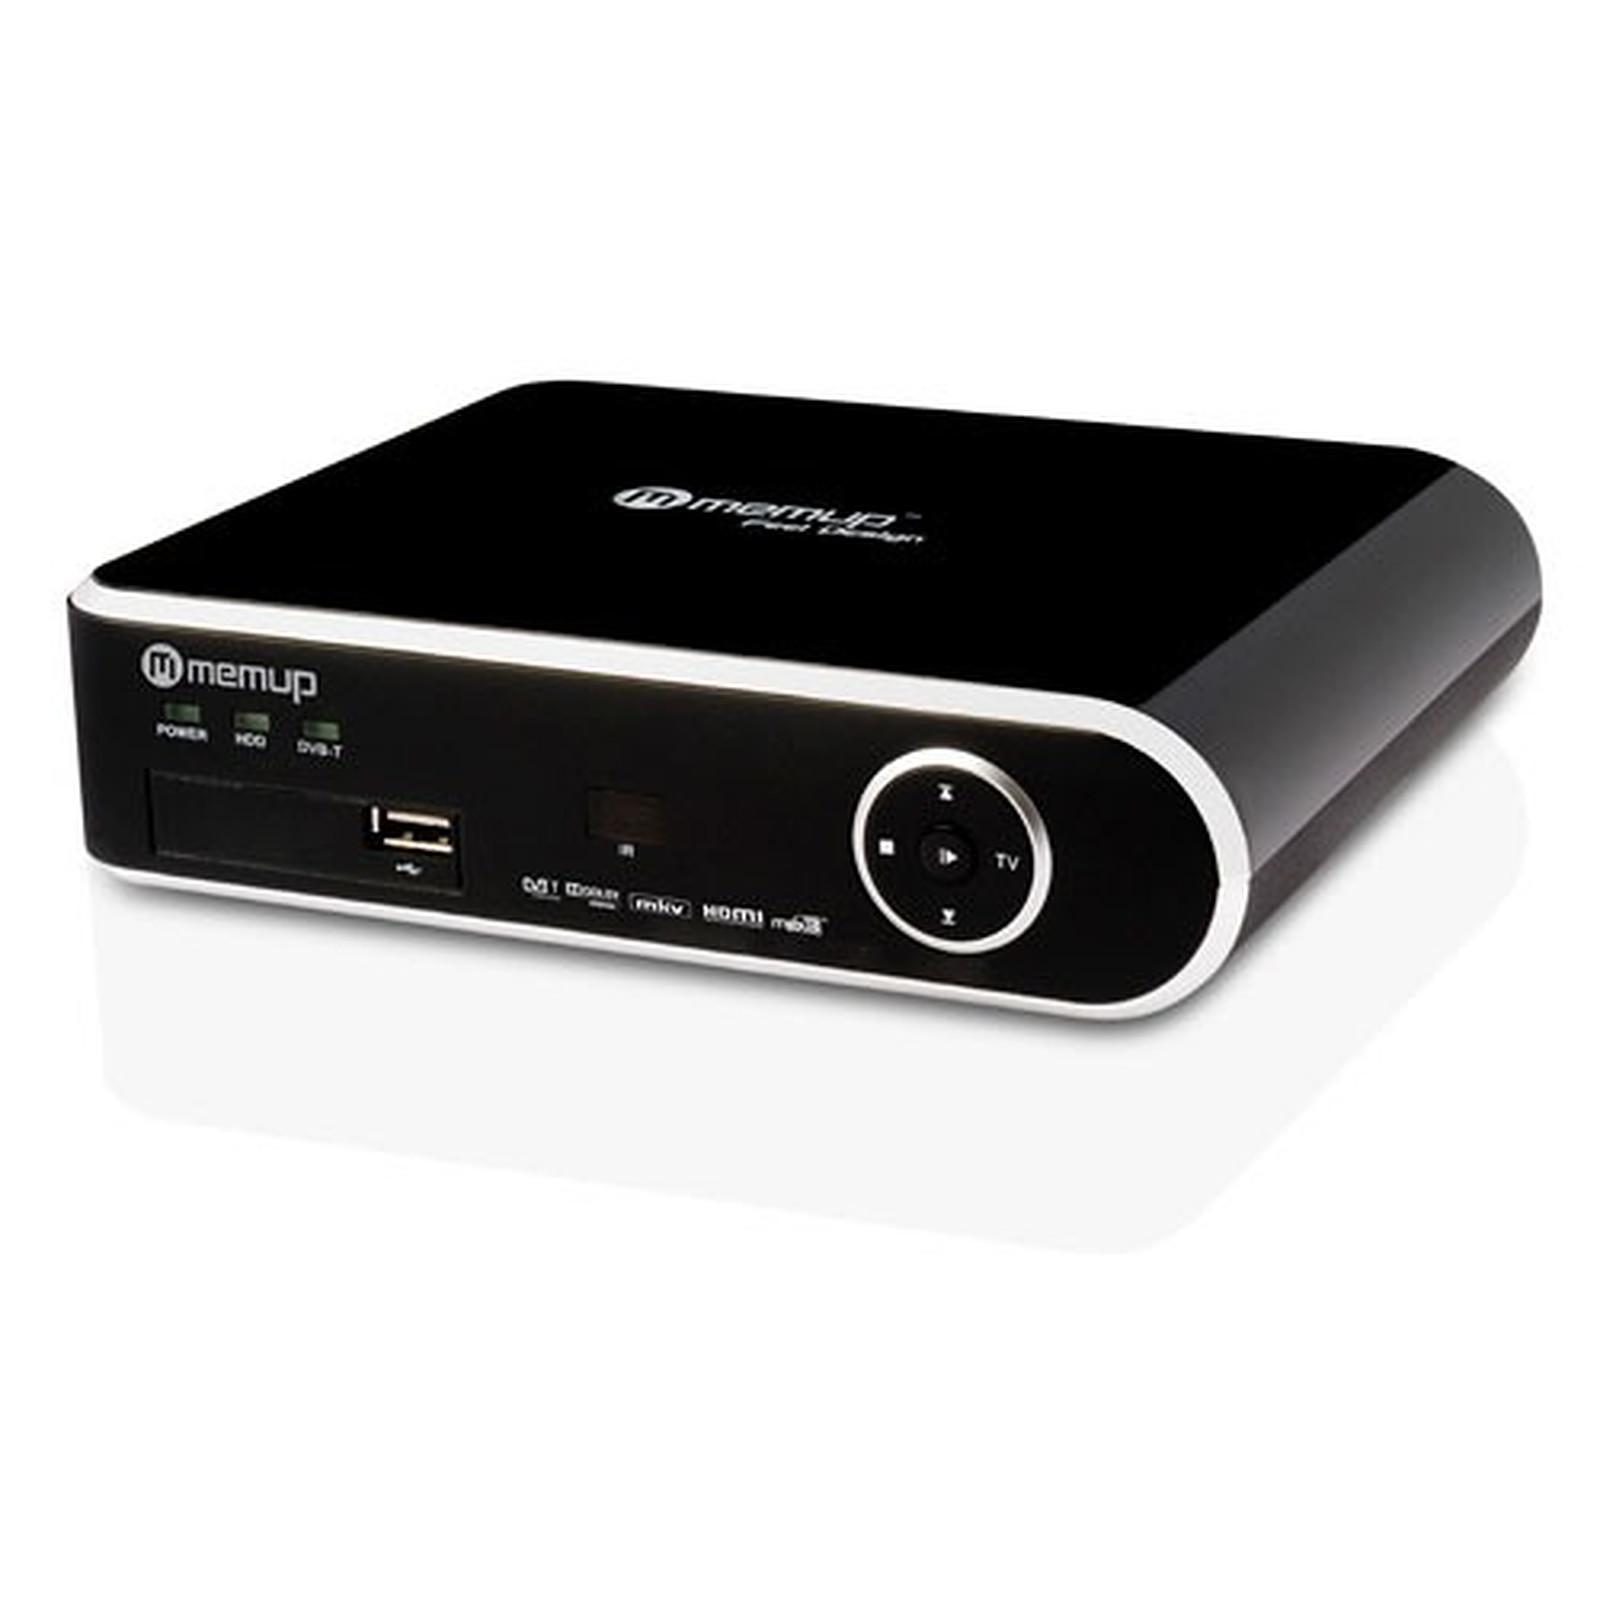 Memup MediaDisk FX TV HD 1 To